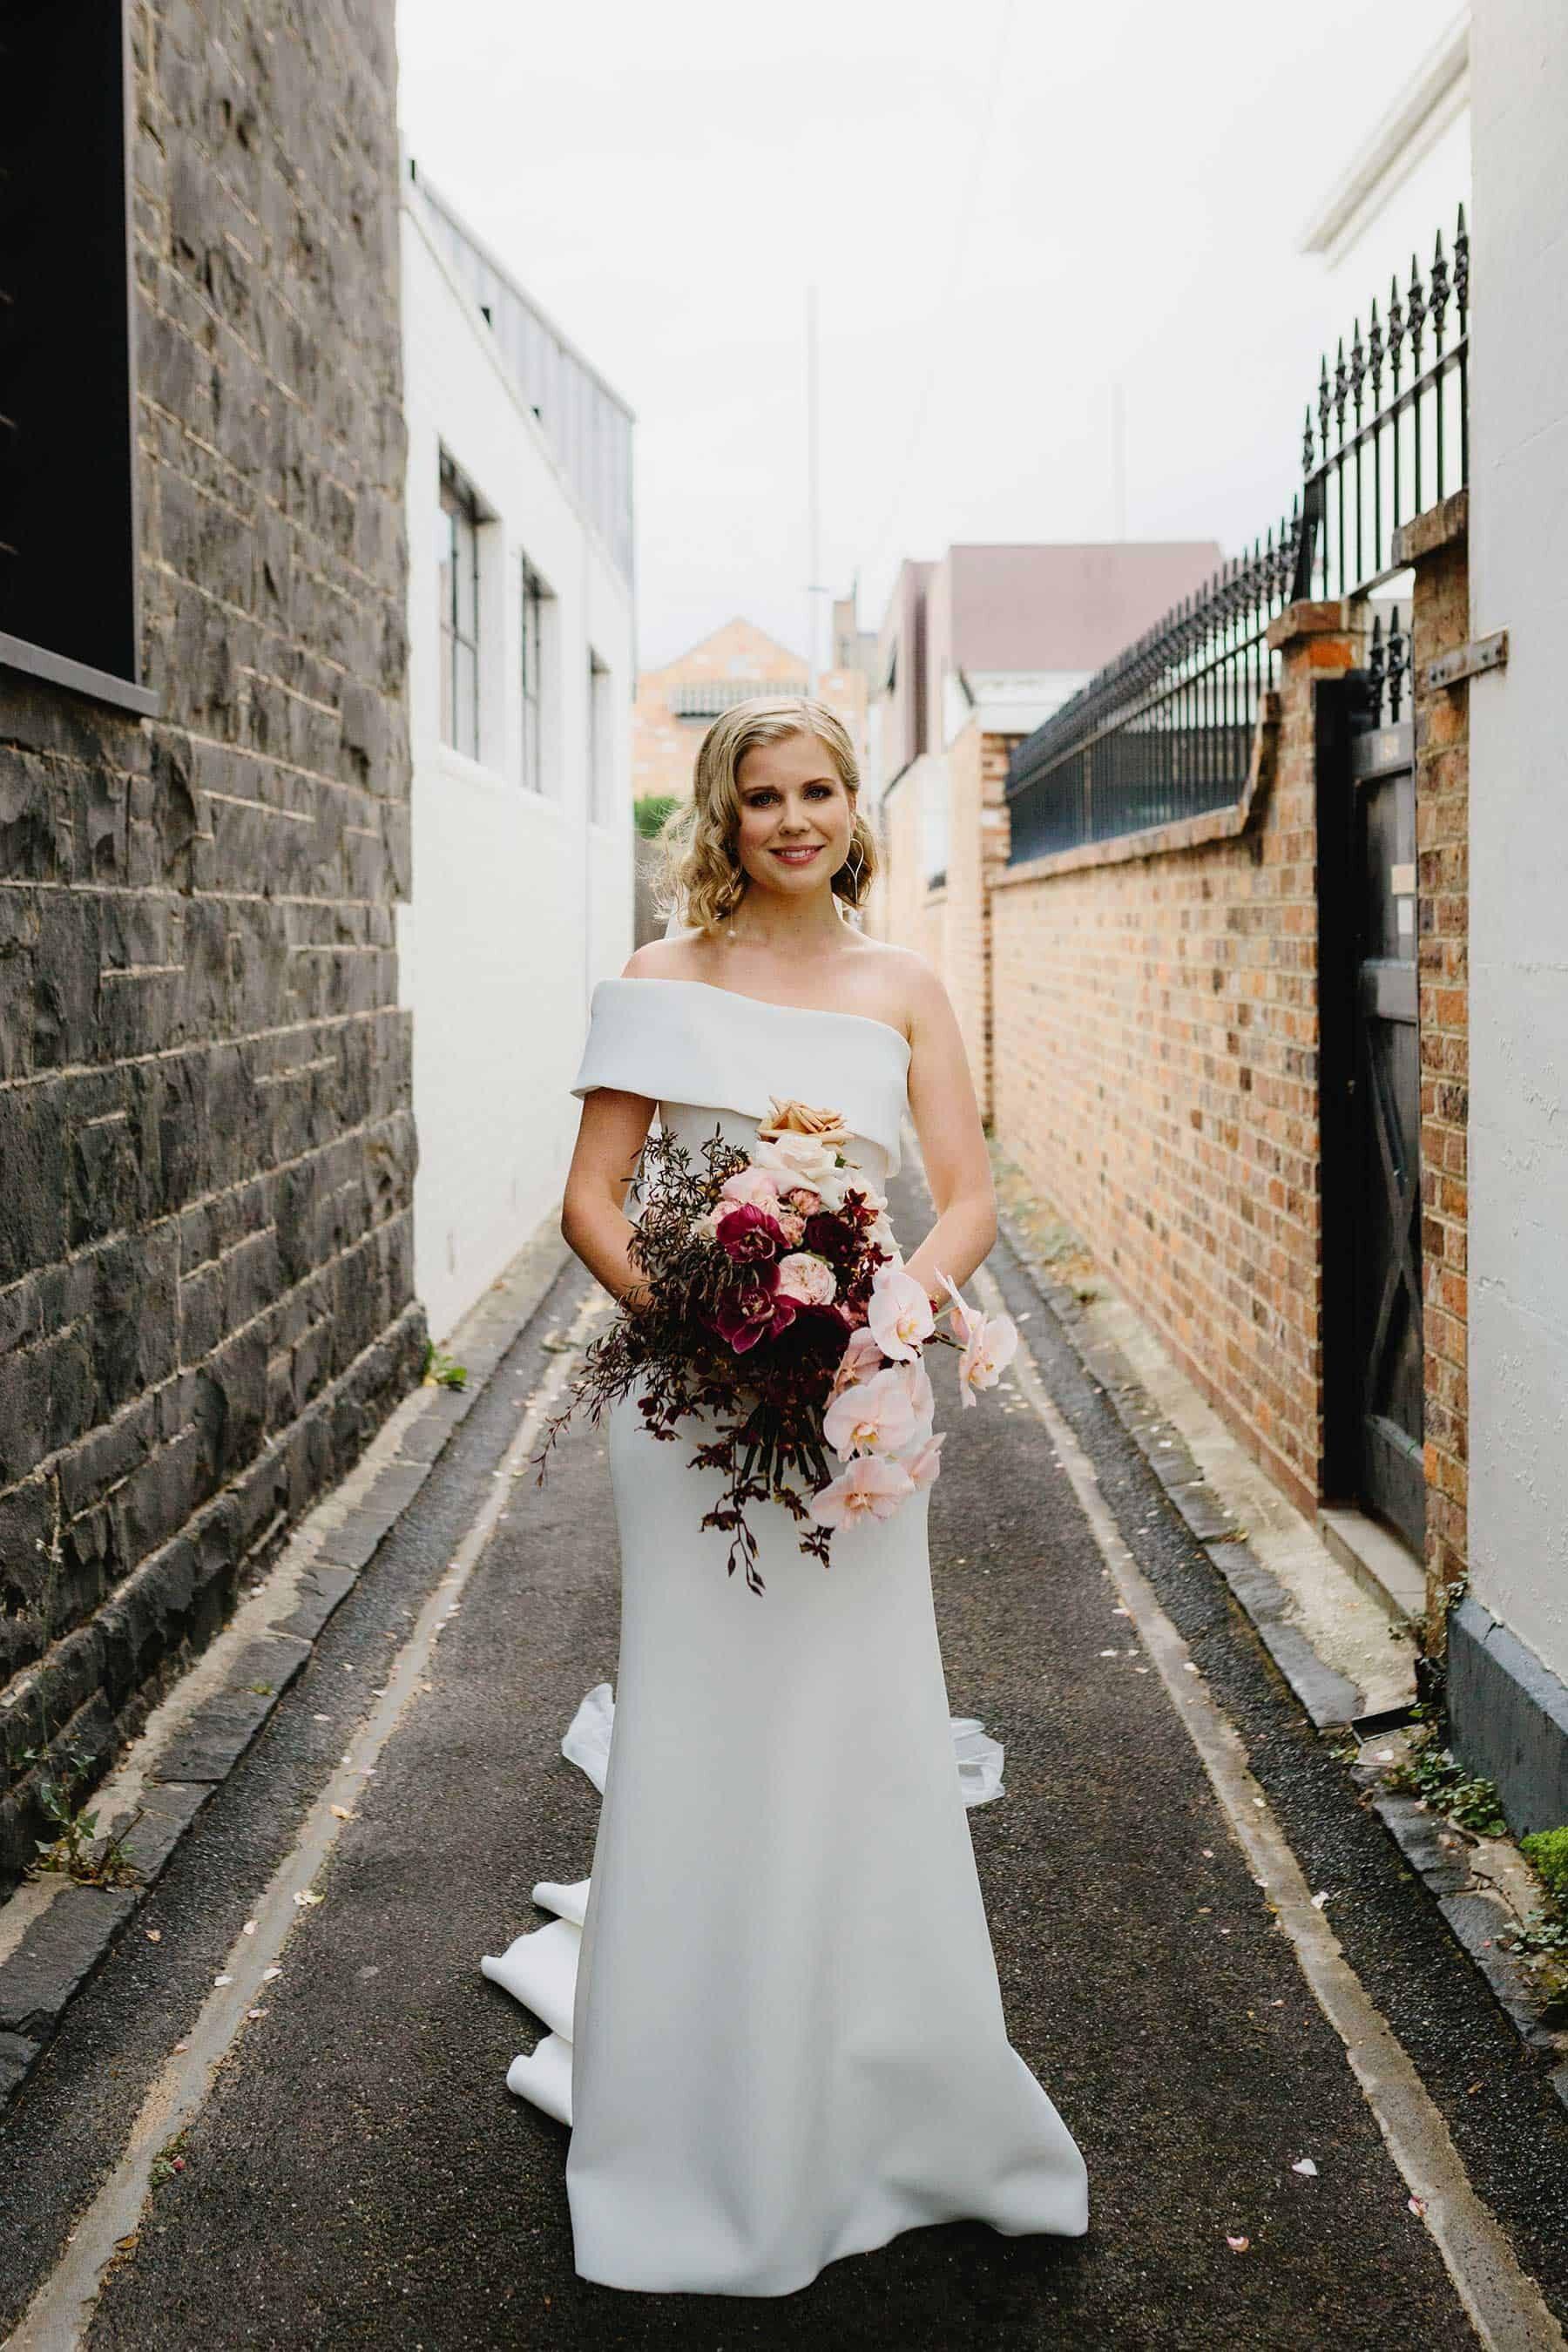 simple off-shoulder wedding dress by Chosen